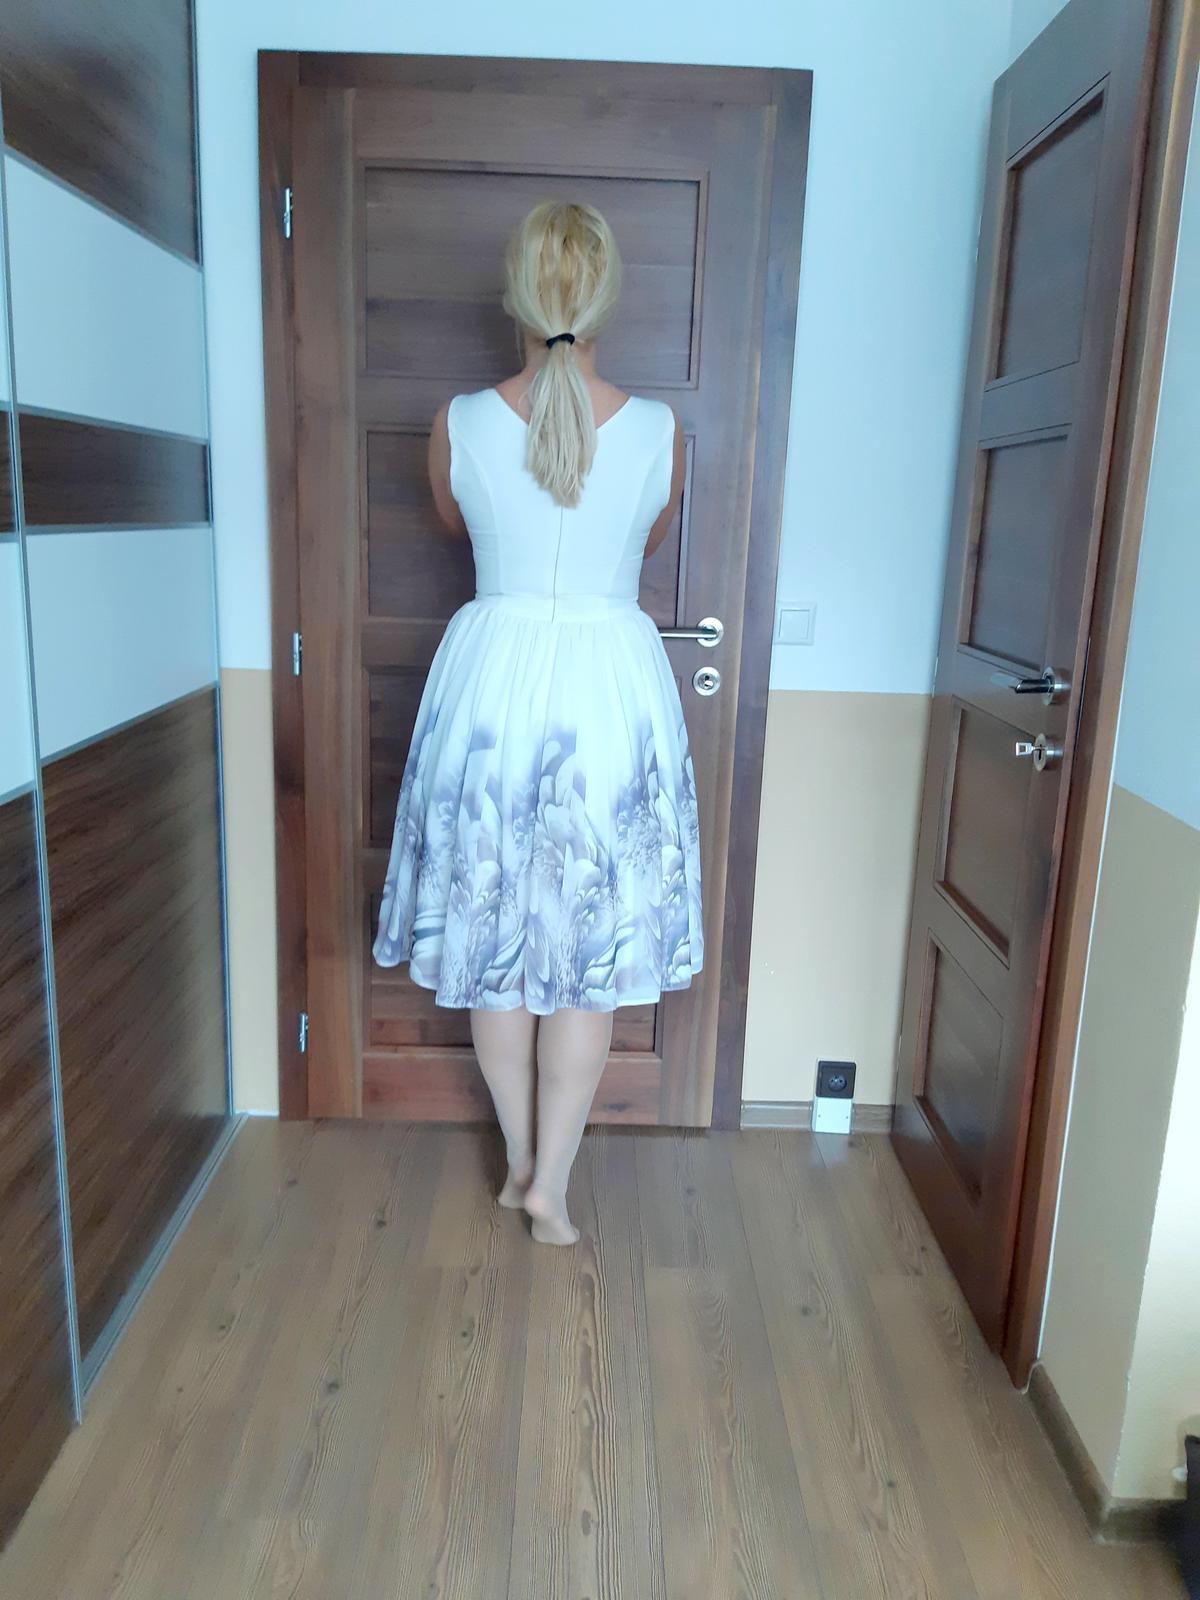 Biele šaty s fialkovými kvetmi - Obrázok č. 2